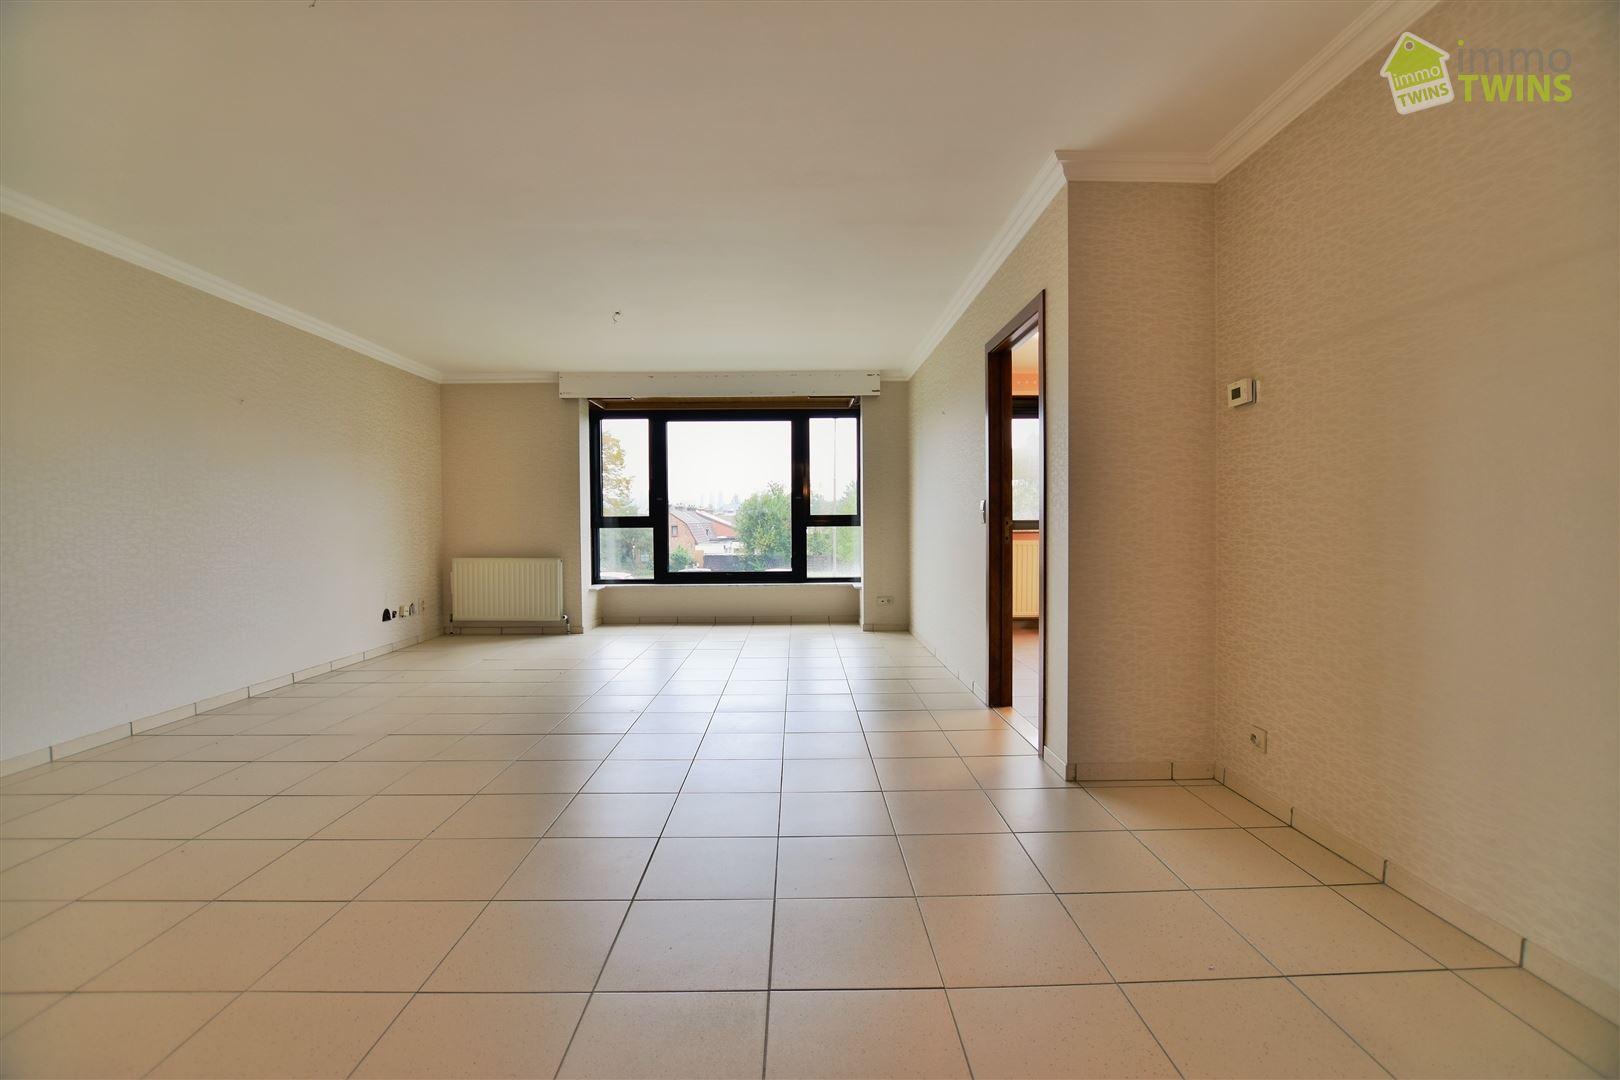 Foto 2 : Appartement te 9200 DENDERMONDE (België) - Prijs € 725